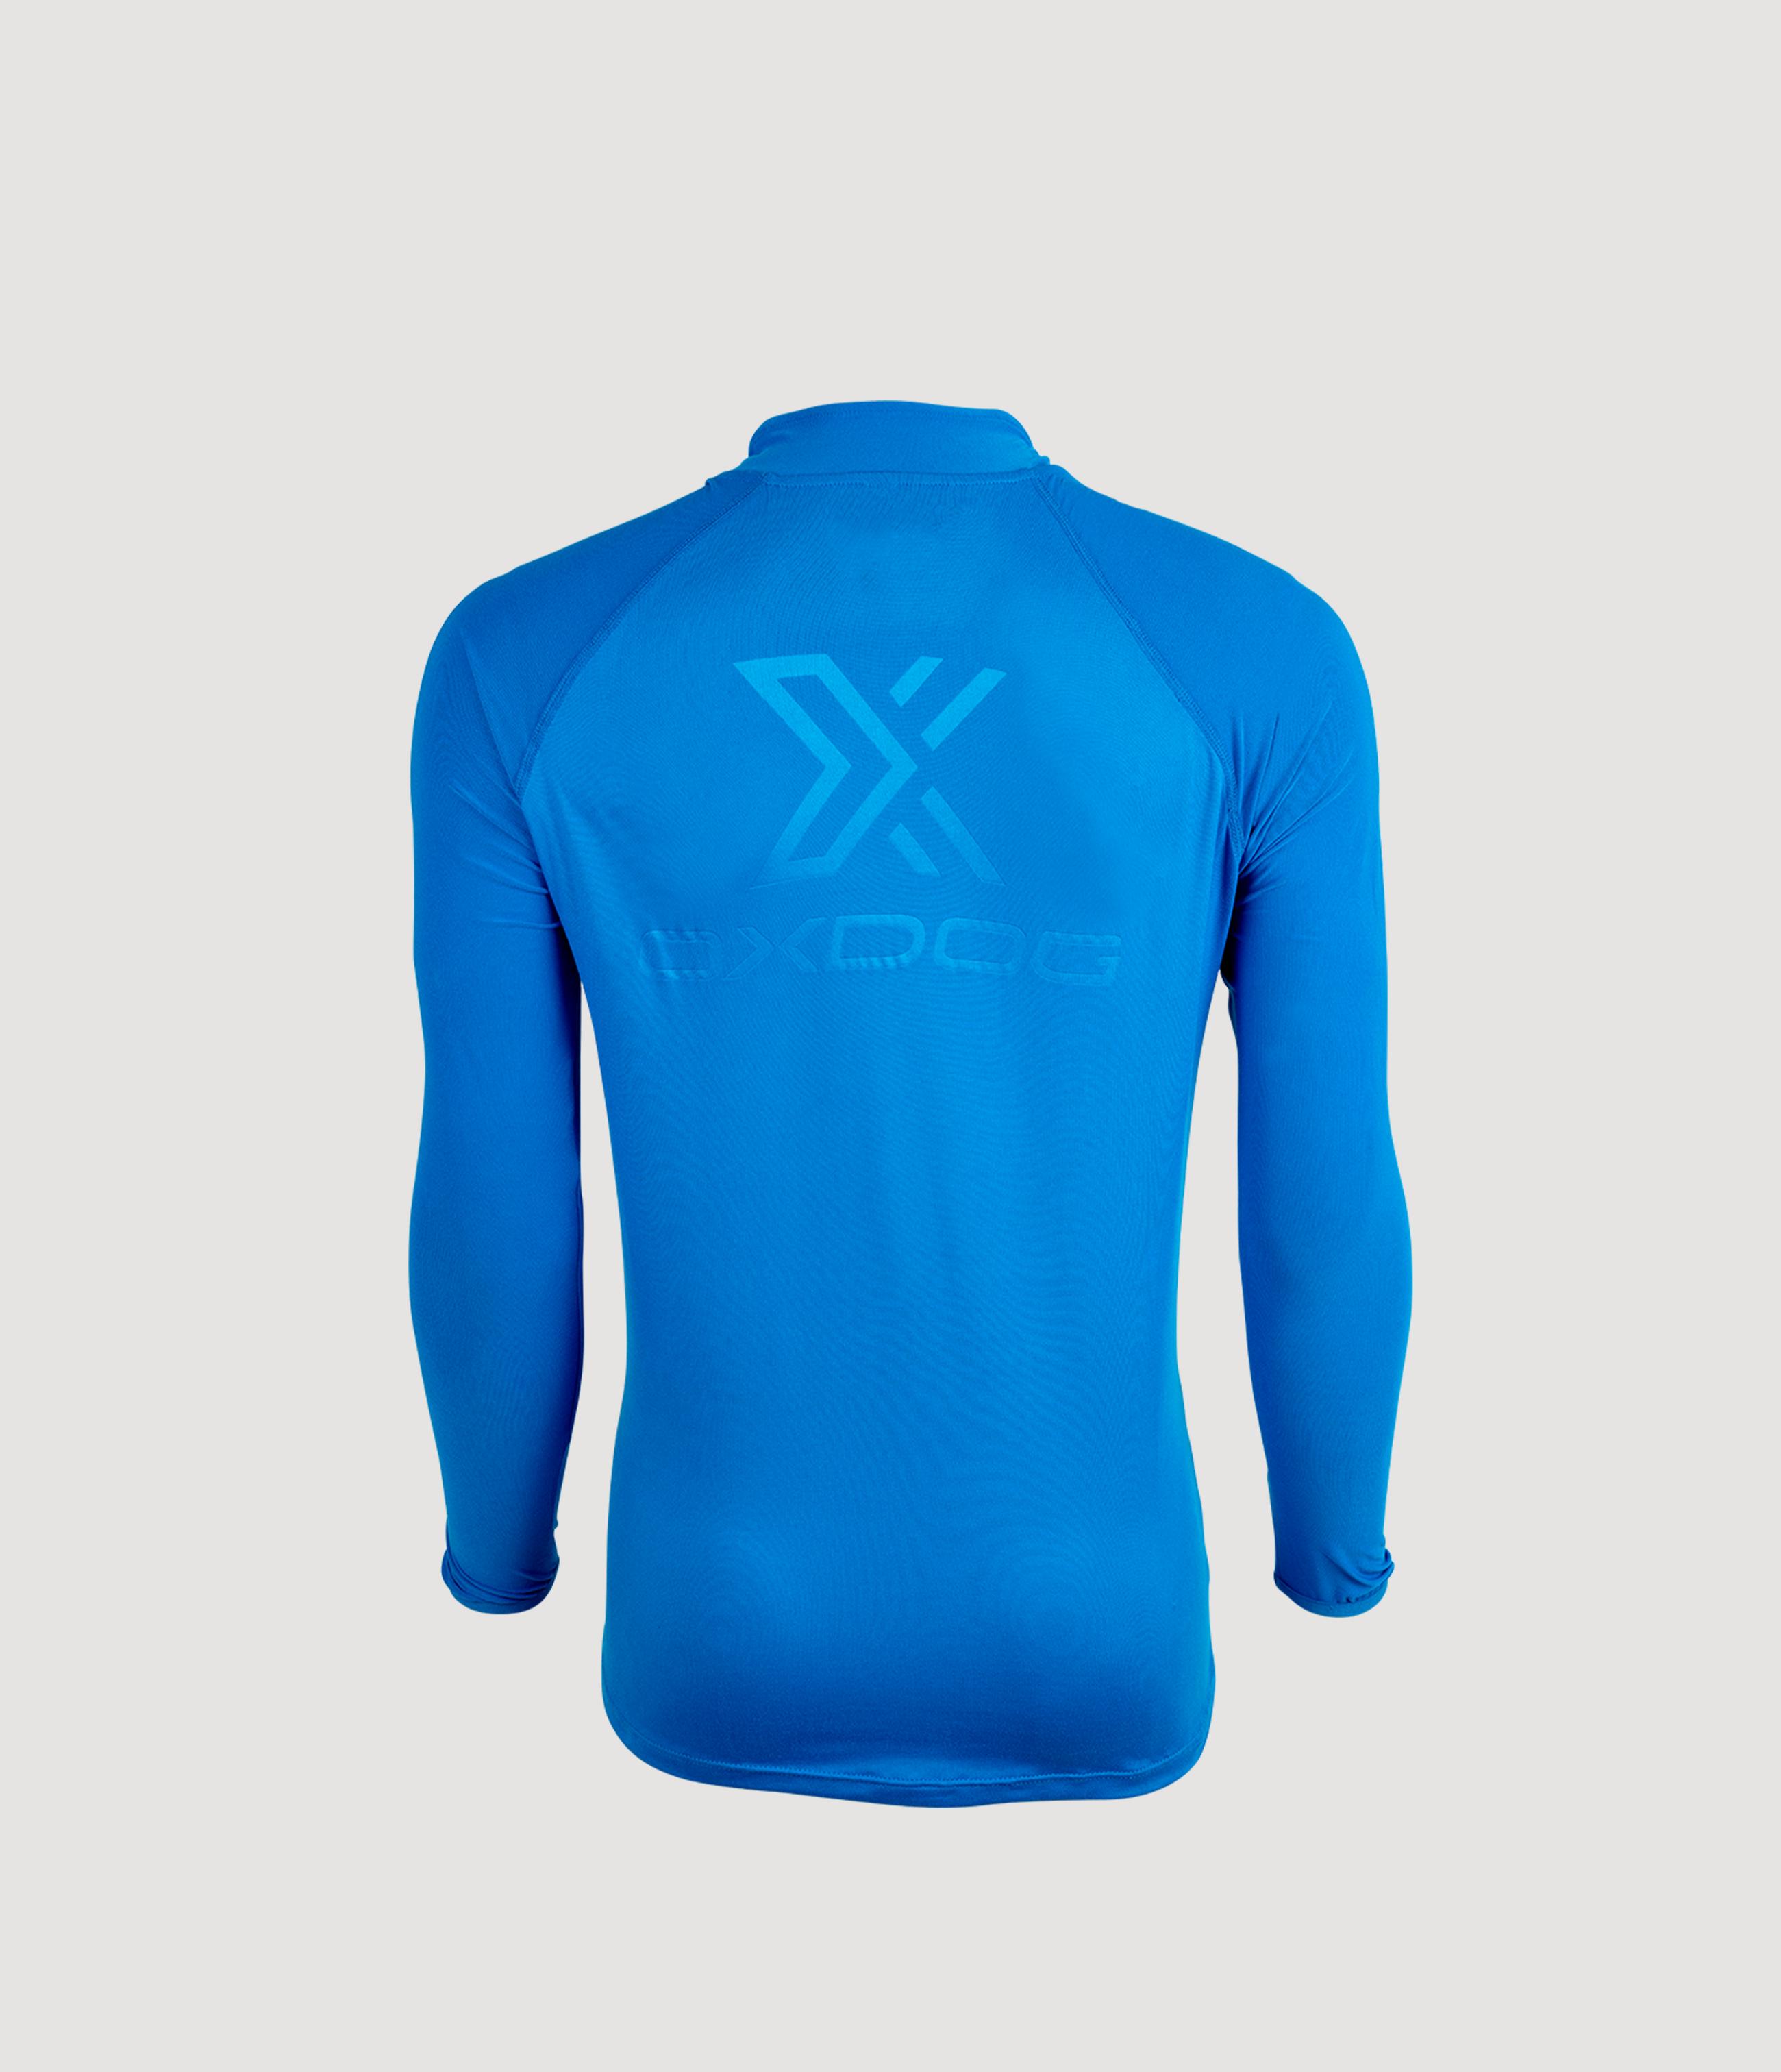 Winton Pro LS WarmUp Royal Blue Back